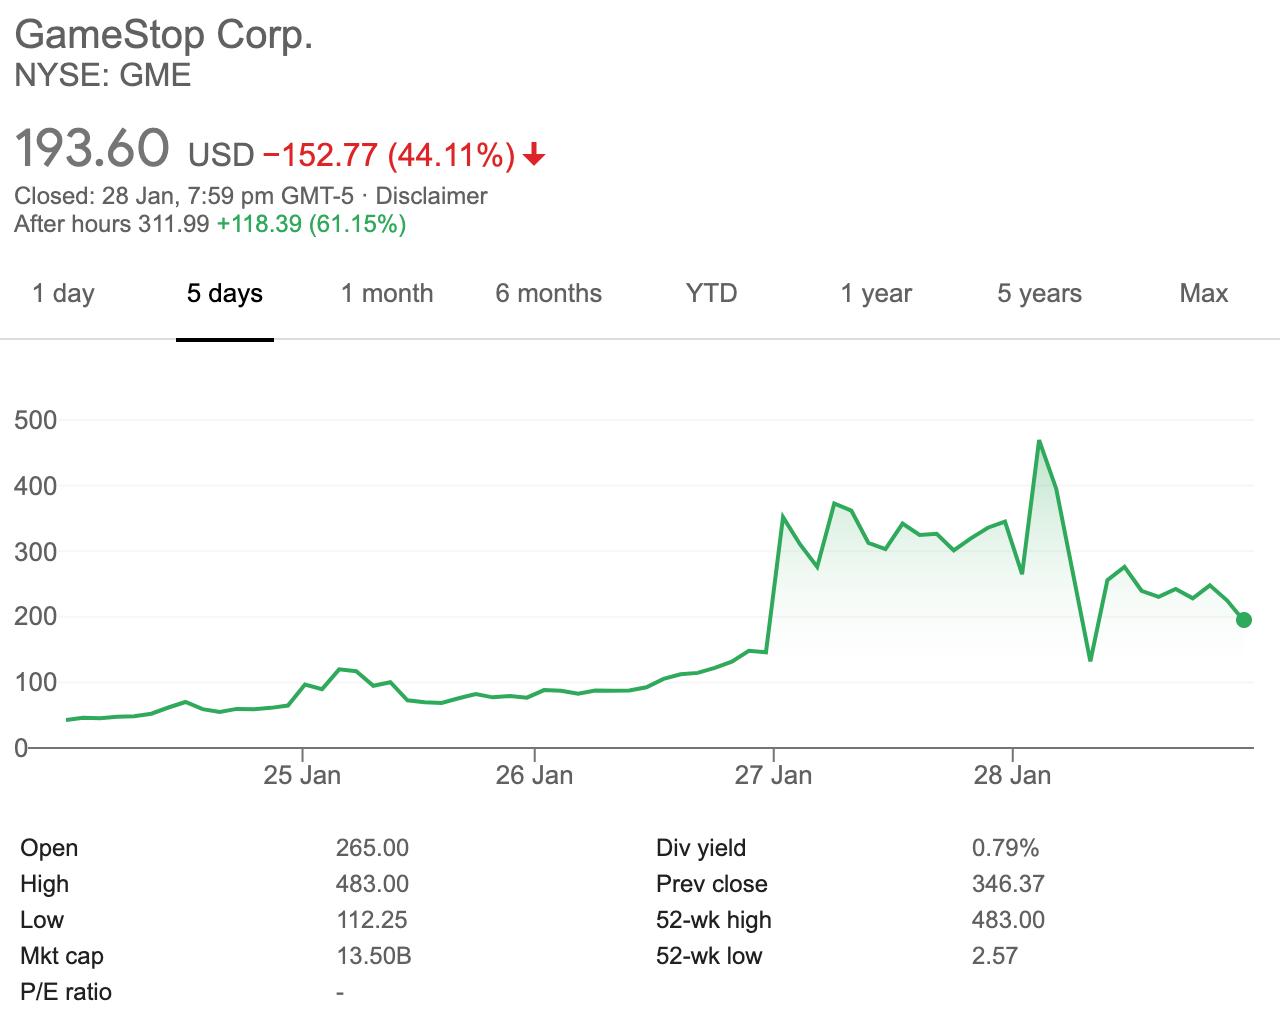 GameStop $GME stock price